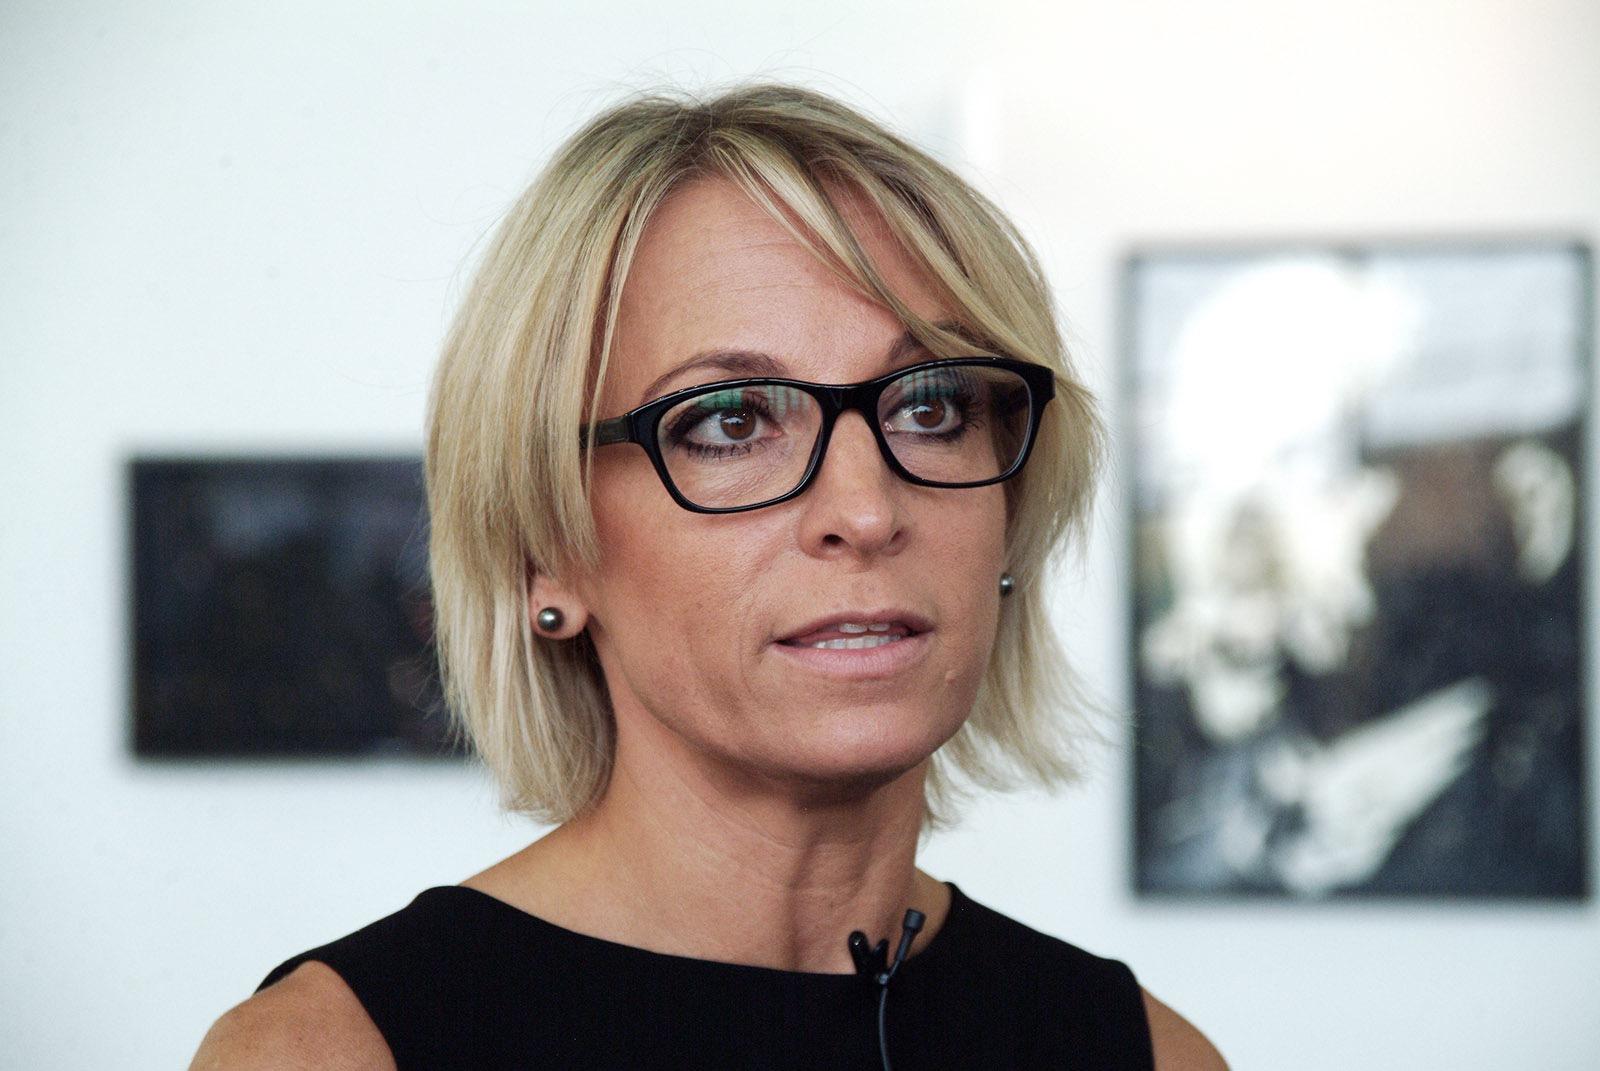 Sarah Cosulich